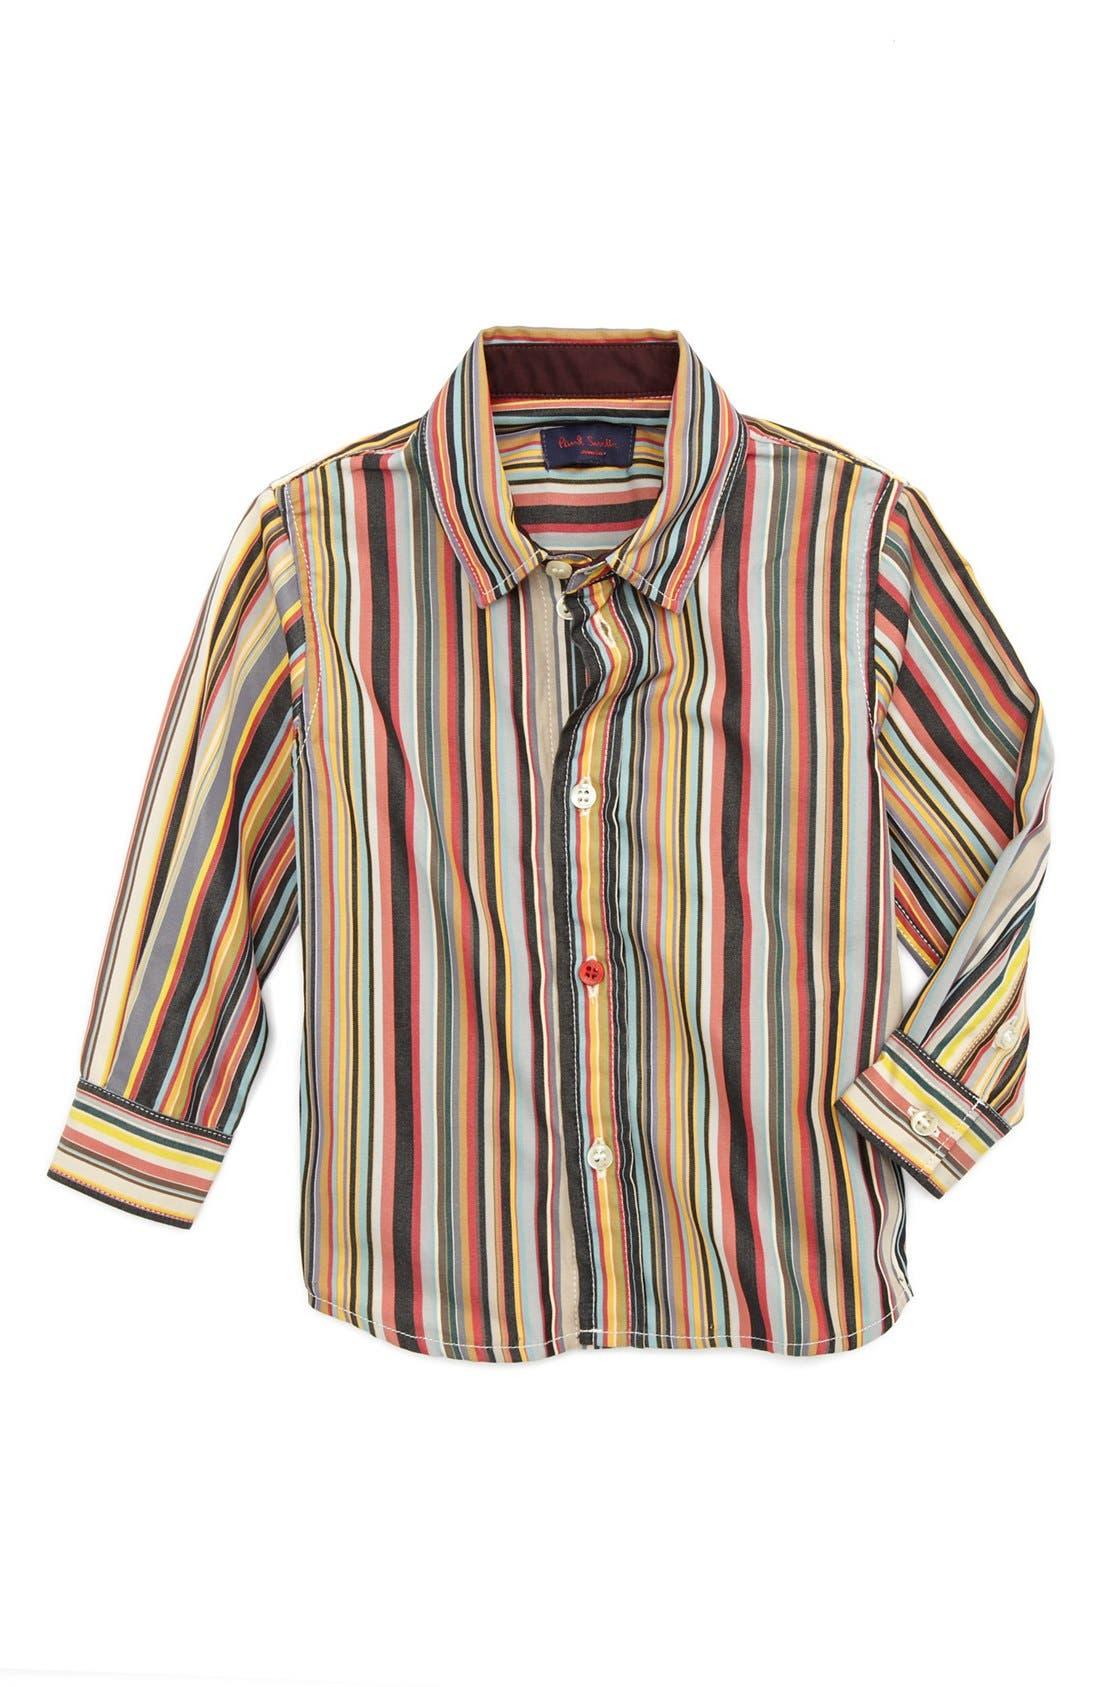 Main Image - Paul Smith Junior Sport Shirt (Baby Boys)